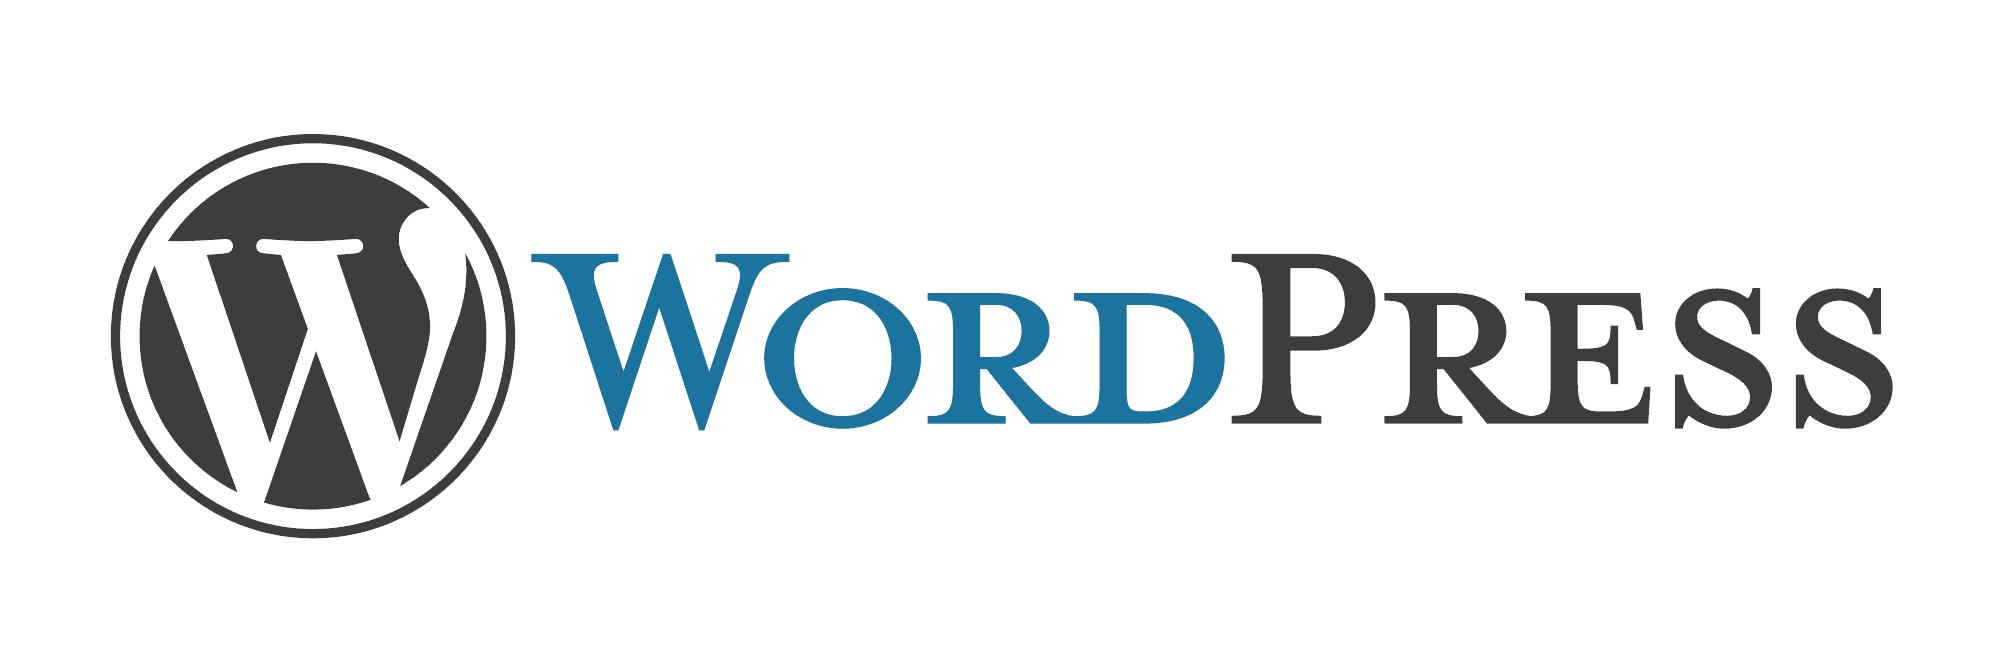 веб студия вебстудия.net wf wordpress